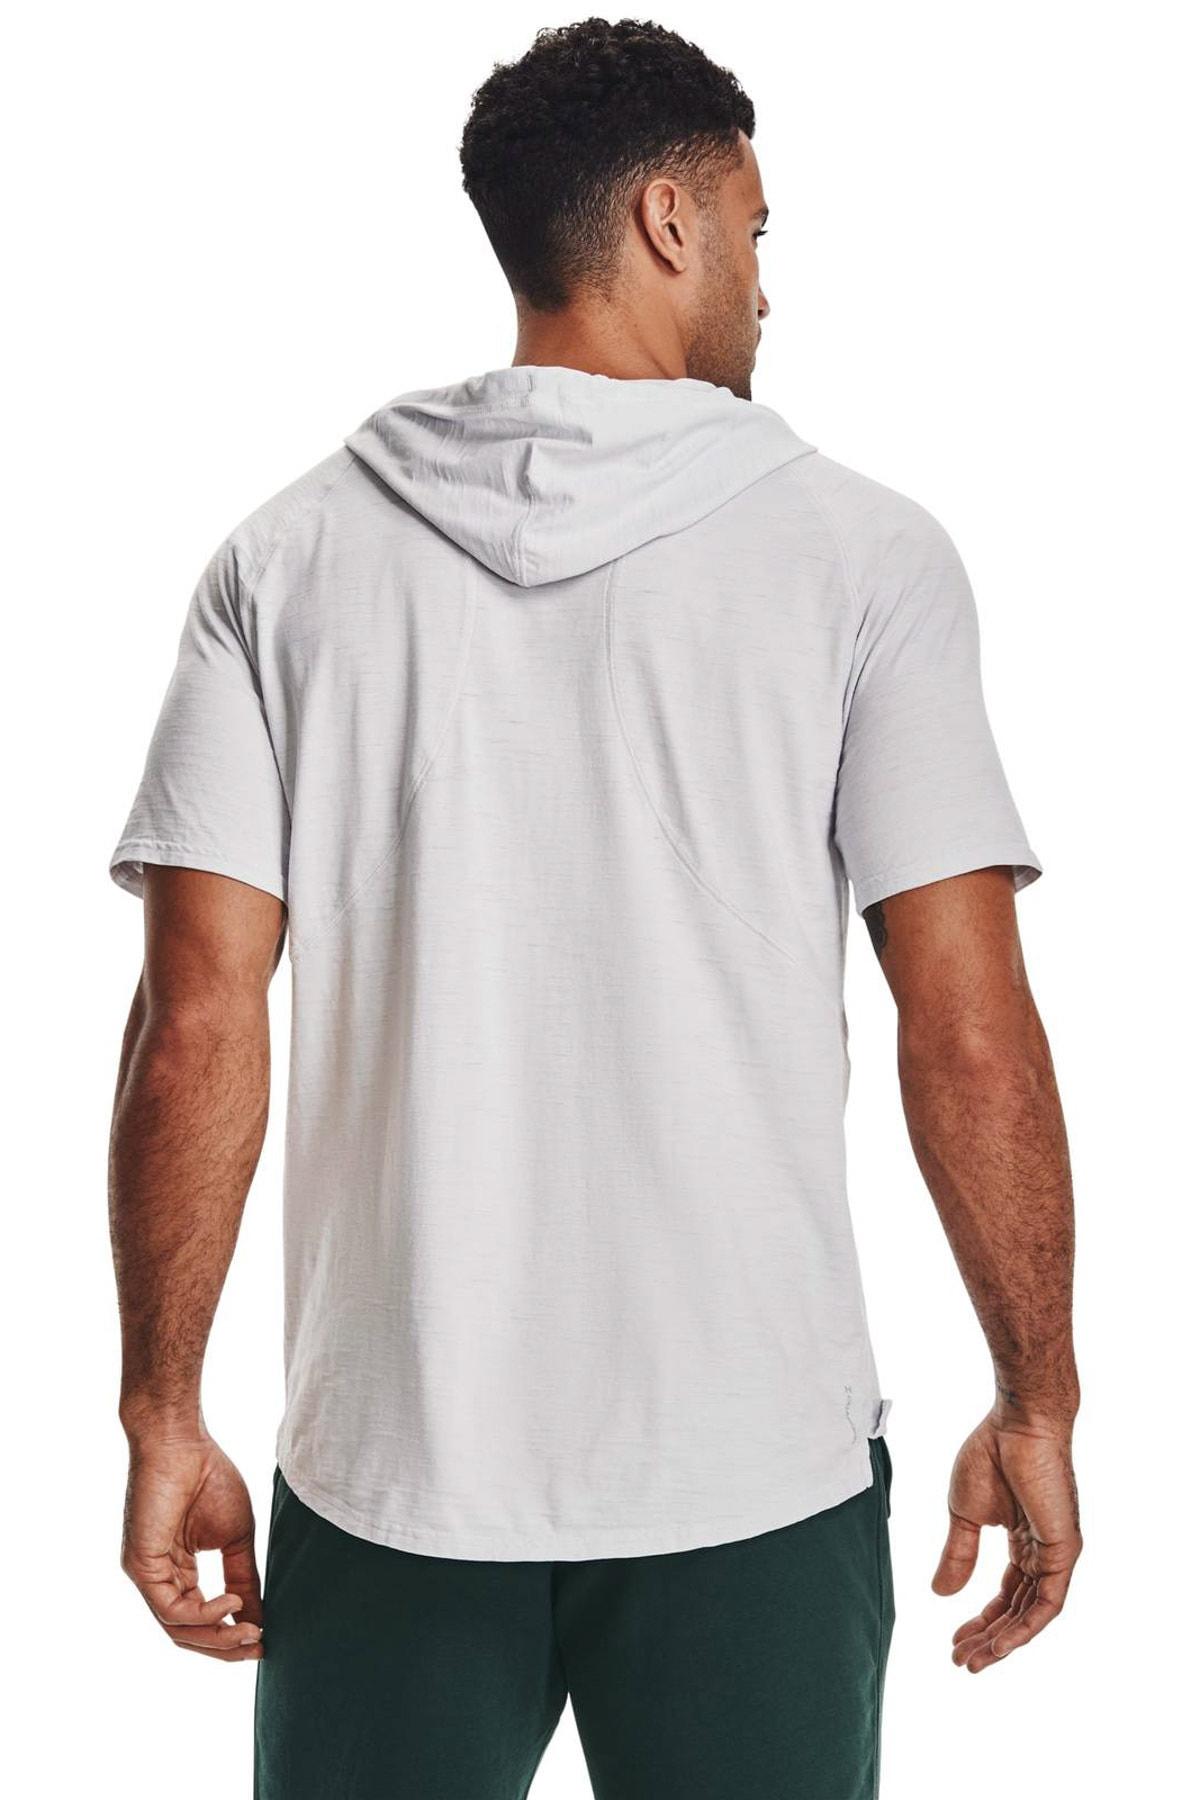 Under Armour Erkek Spor Sweatshirt - UA PROJECT ROCK CC SS HD - 1361719-014 2